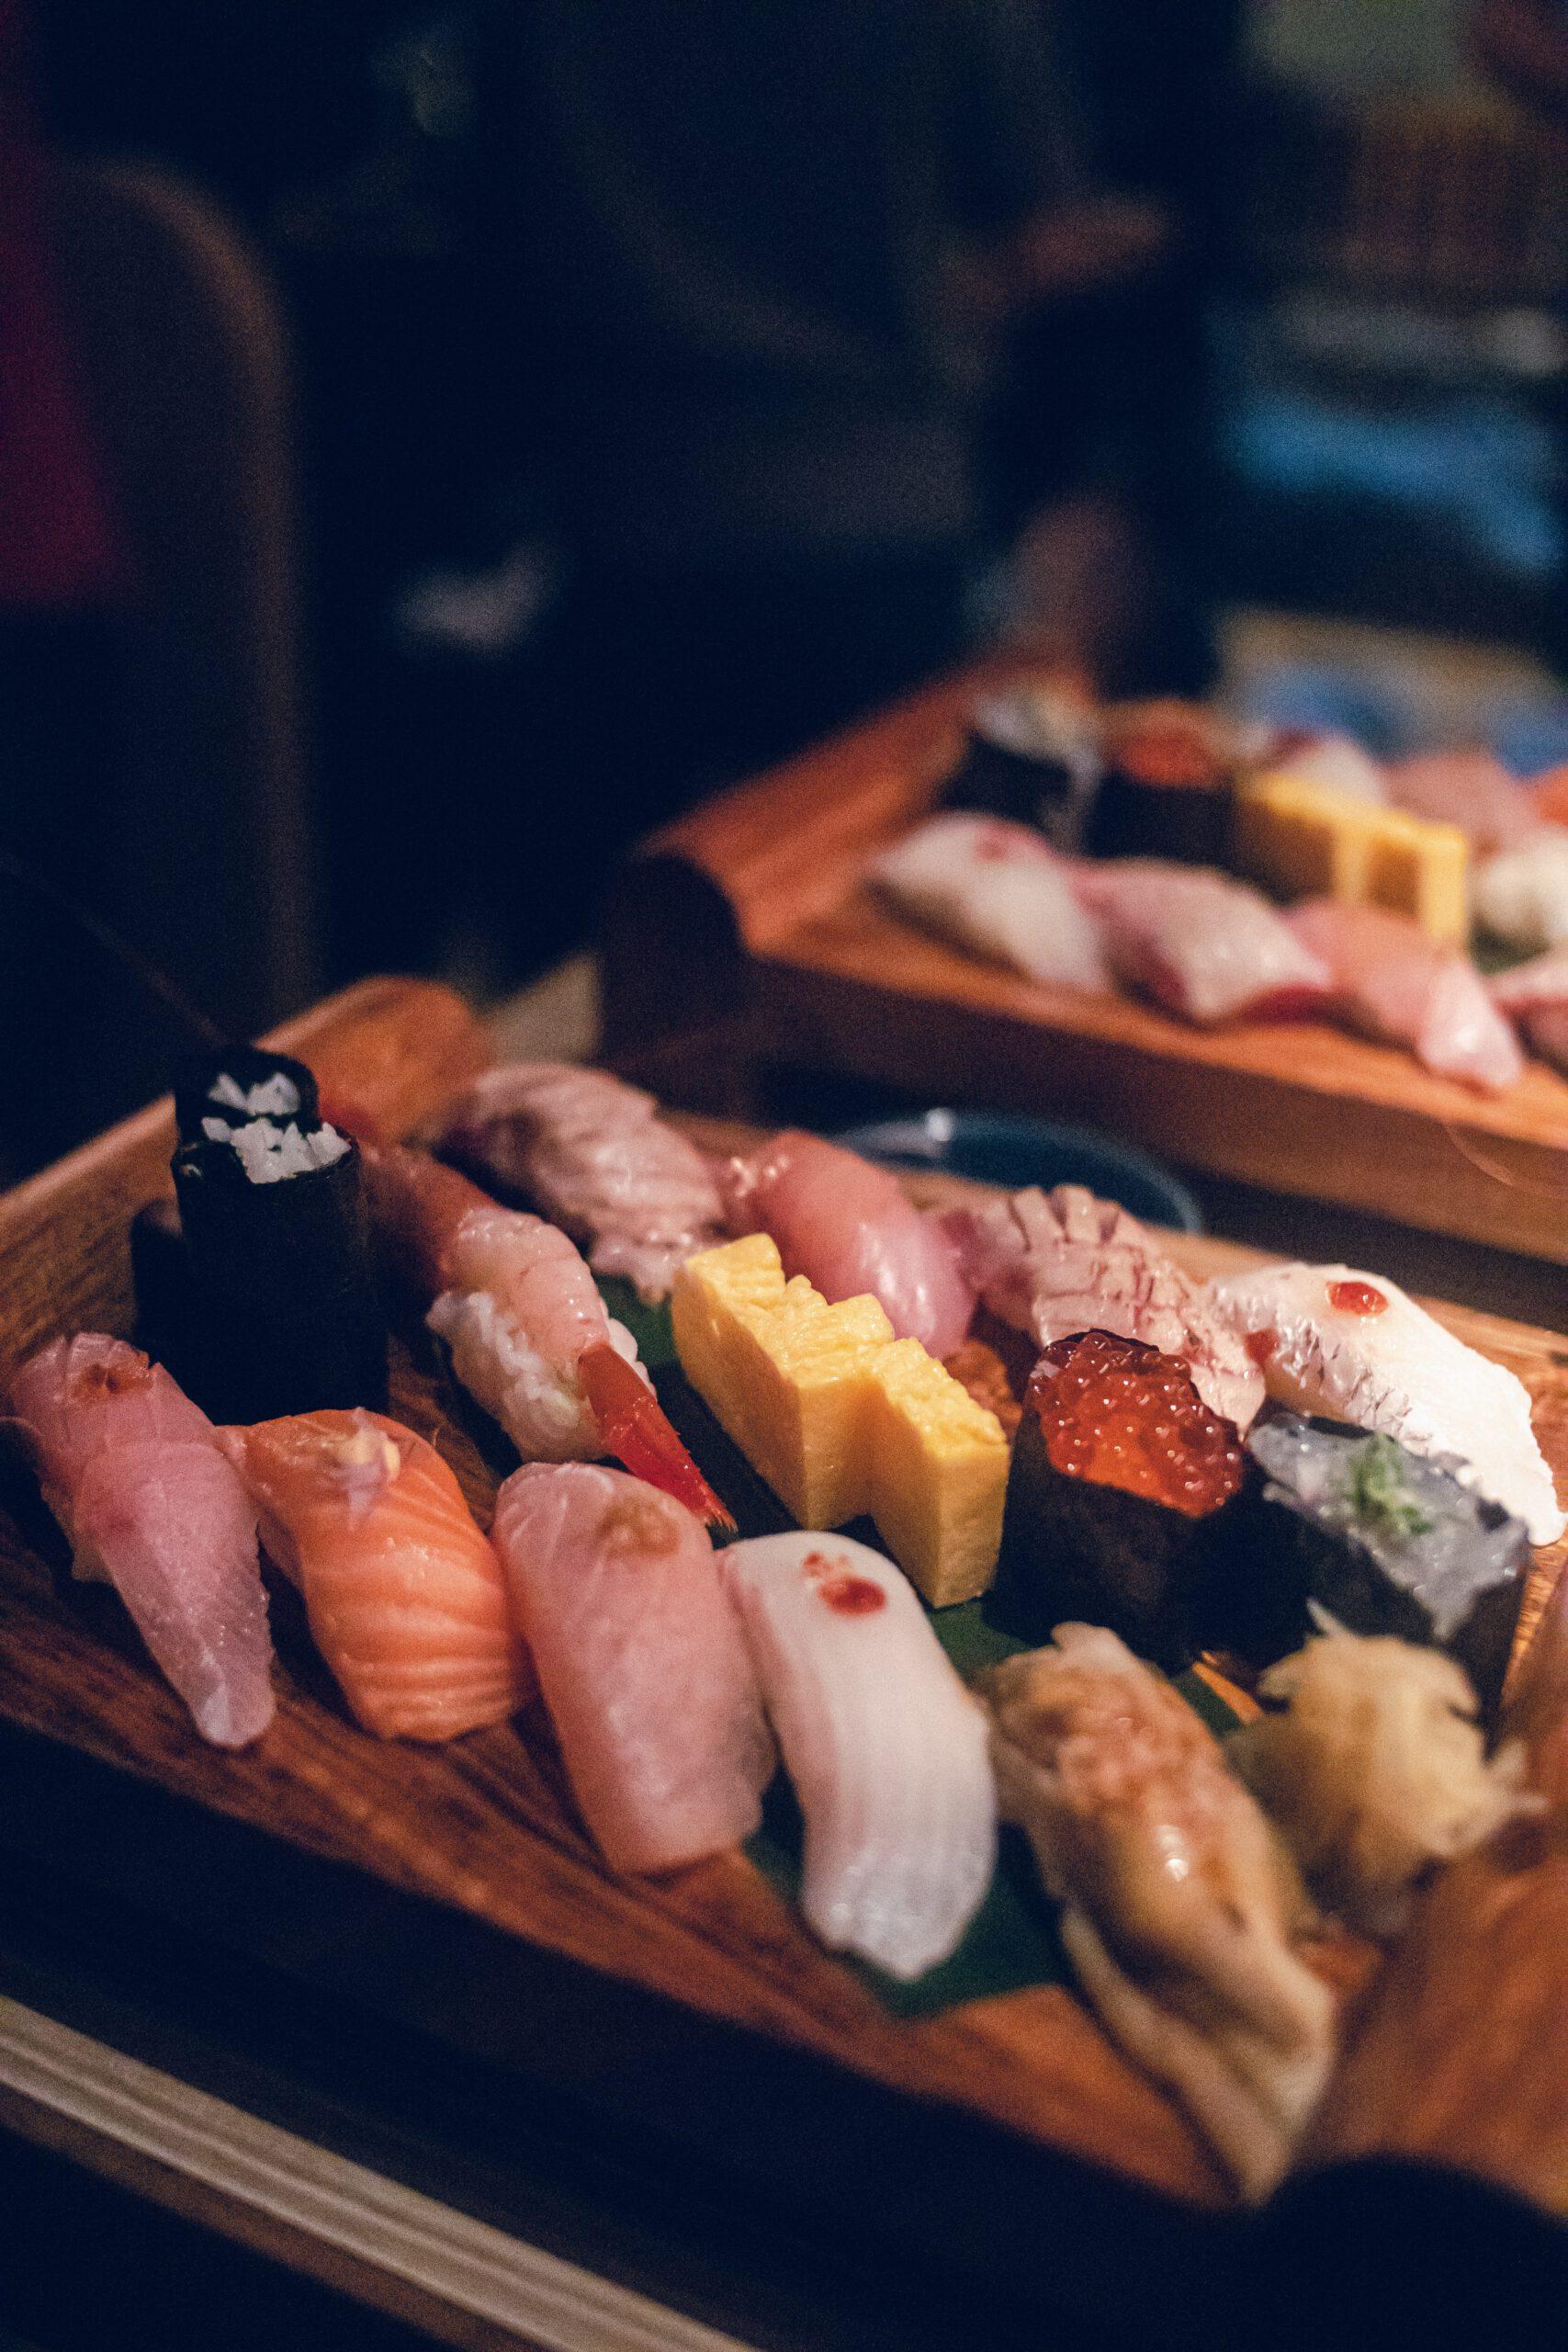 Asia-sushi-bar im Kaufland Spandau, 13581 Berlin